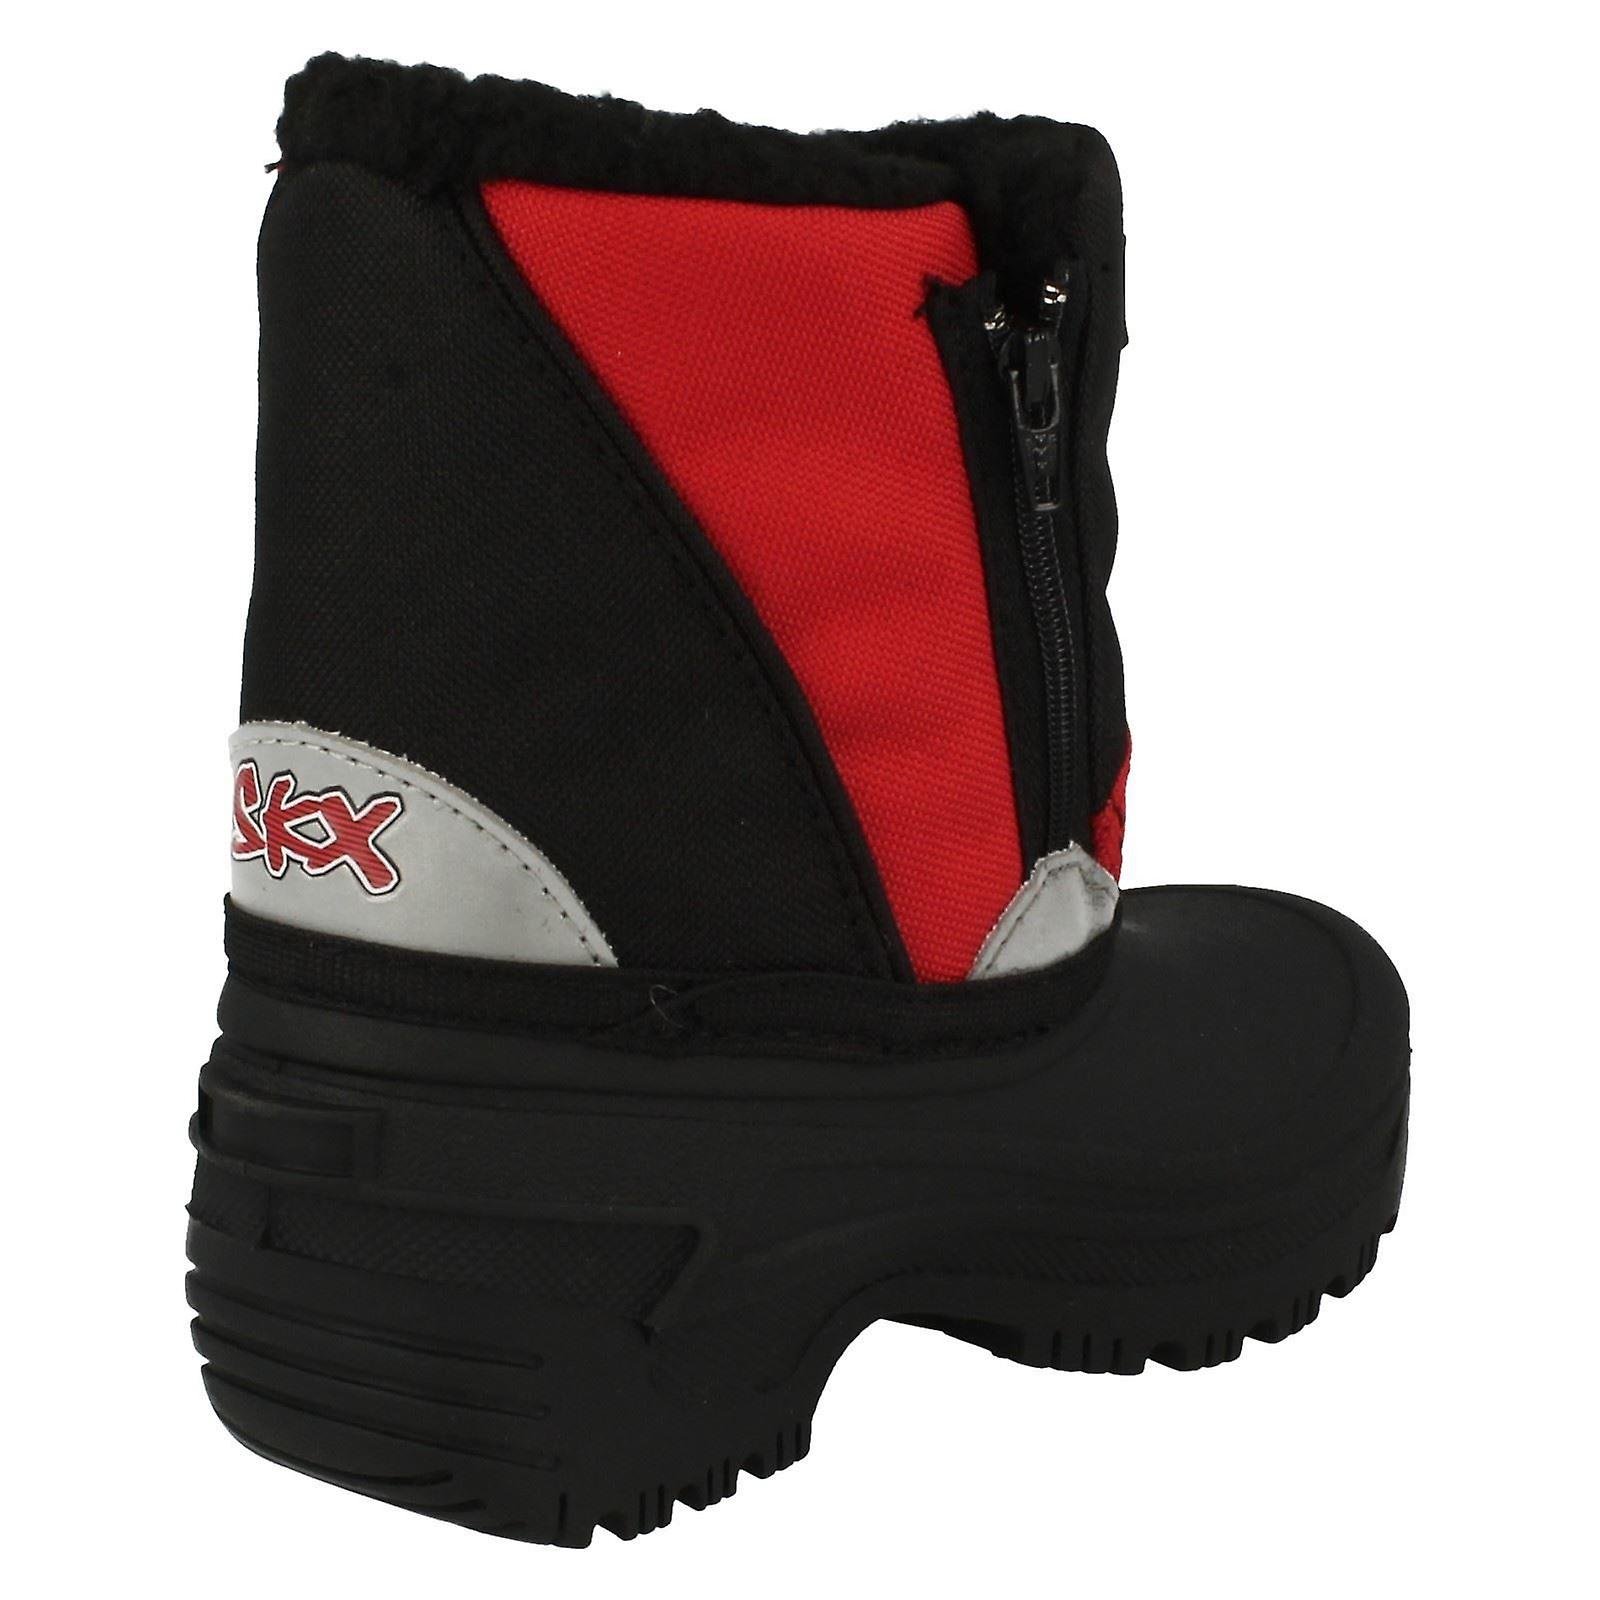 cf12515d13b82 Infant Boys Skechers Mor-Tex Water Resistant Boots Carbuncle